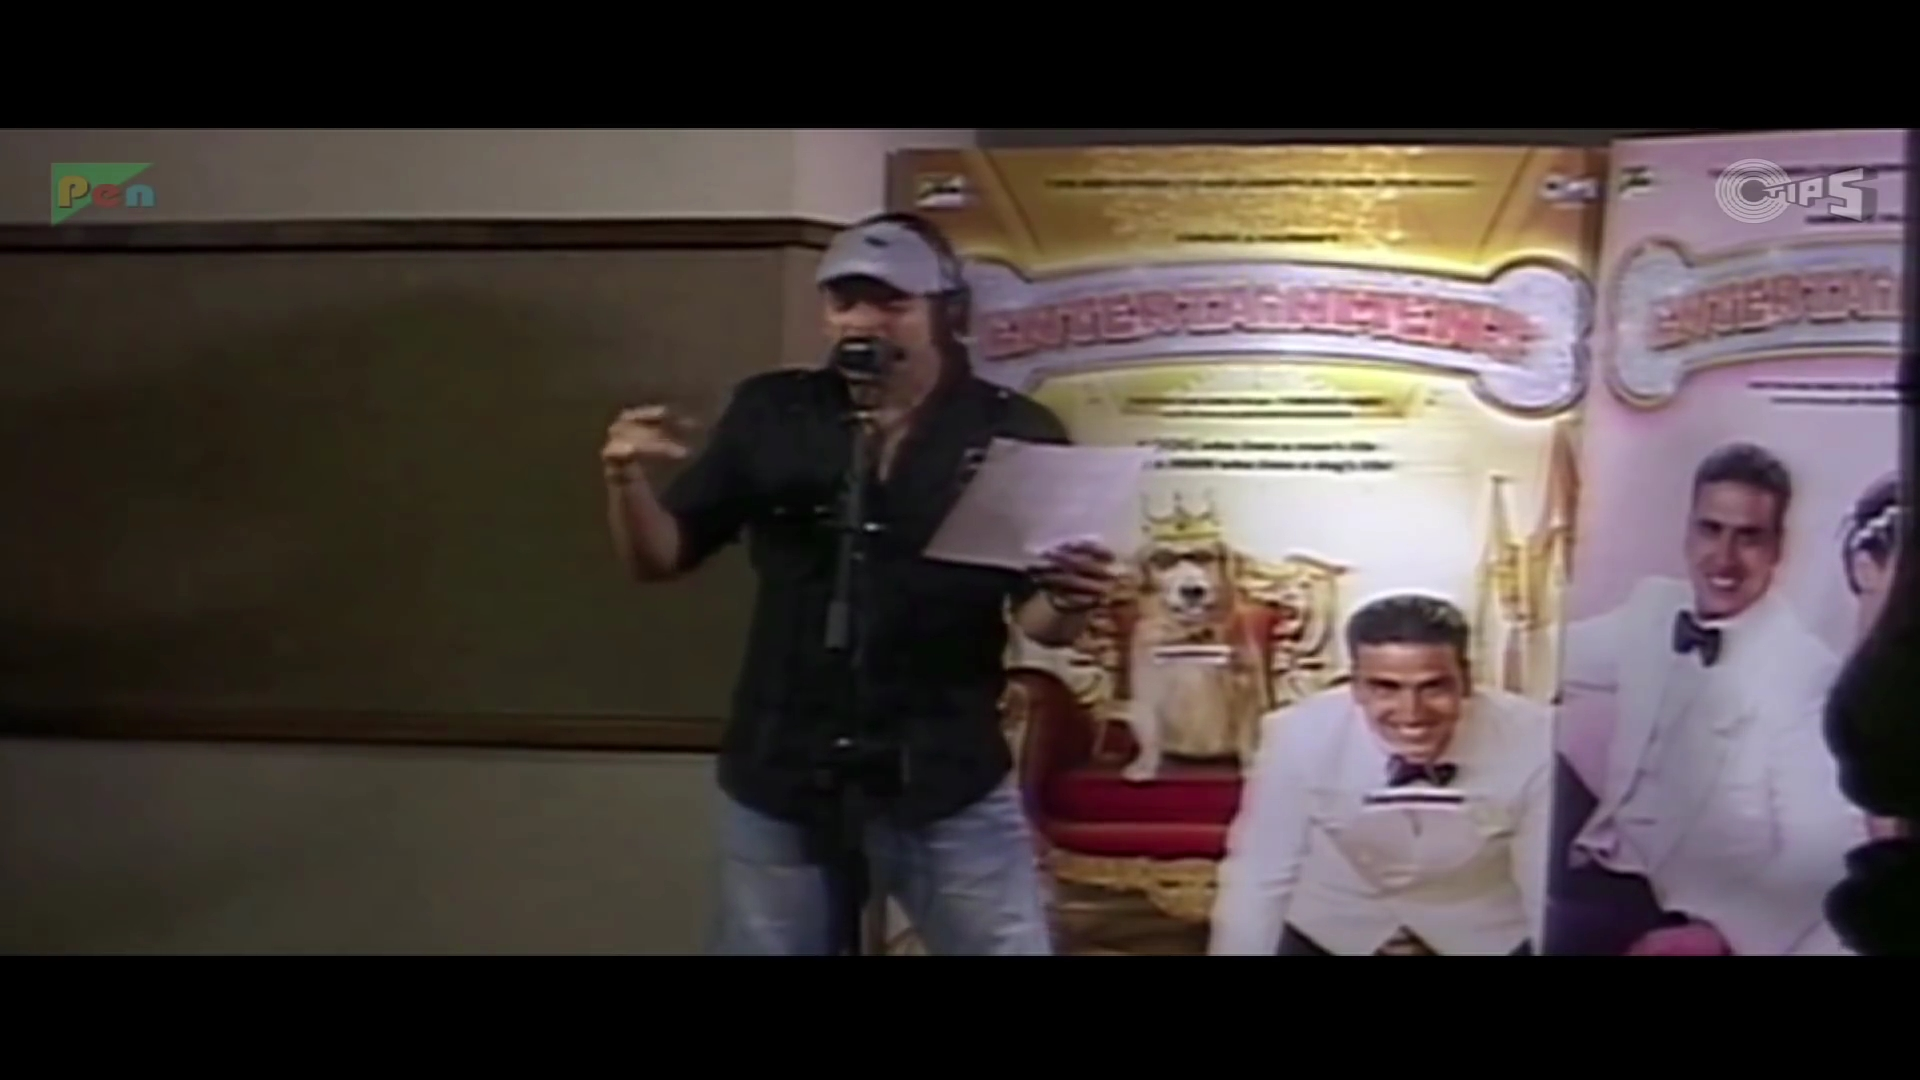 z_2014 - Akshay Kumar Sings  Maange Maange - Entertainment_1080p.mp46932.jpg